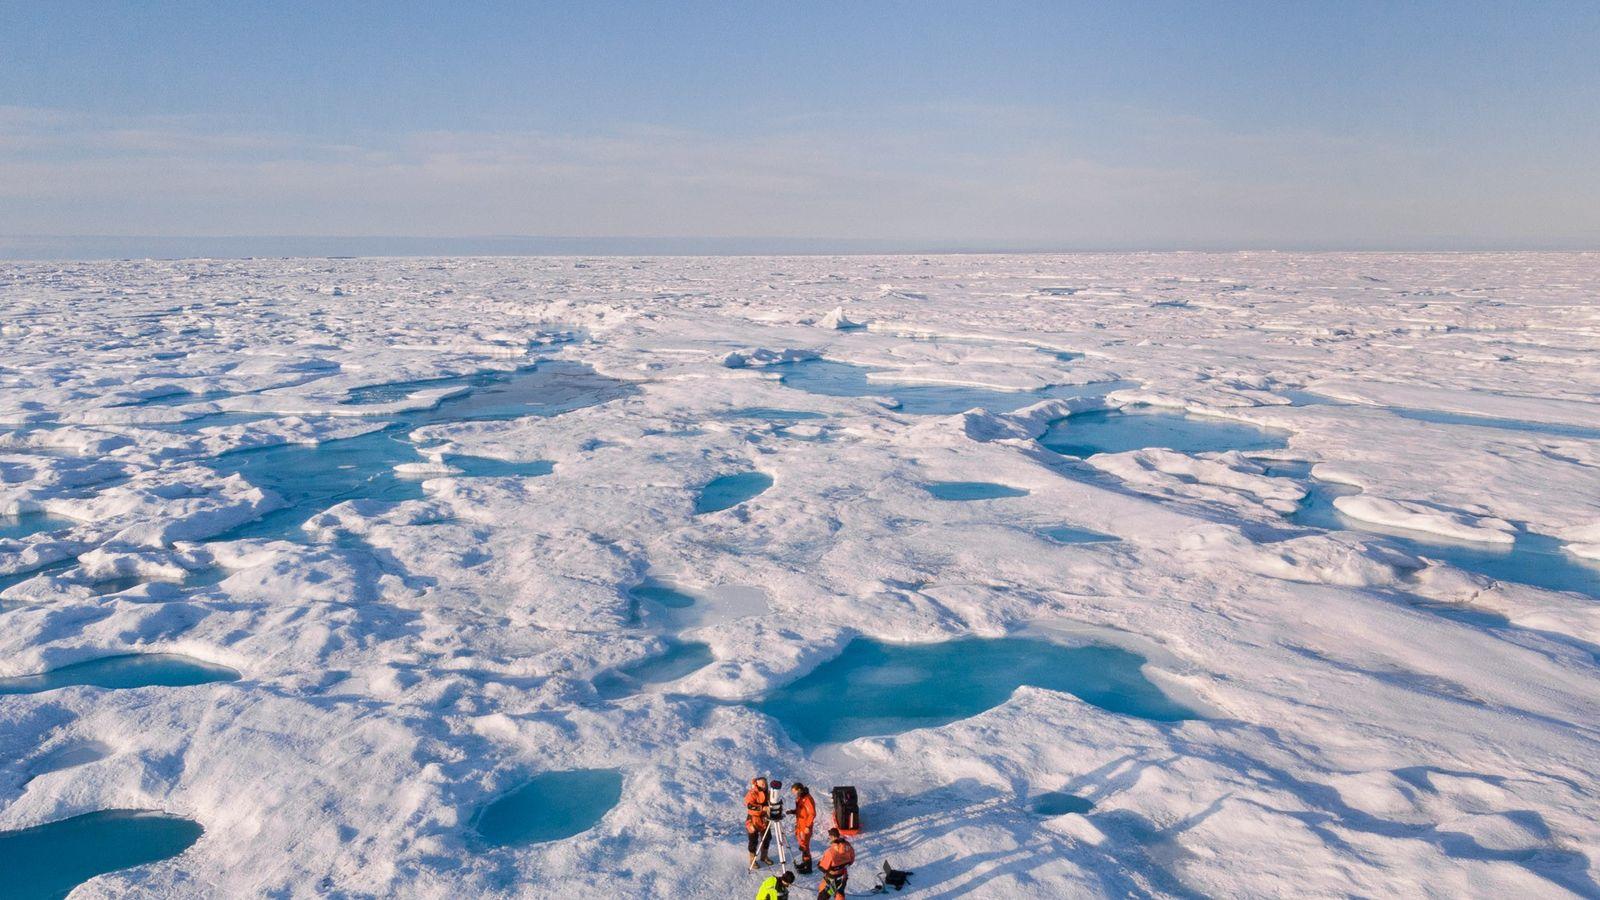 Banquisa del mar de Groenlandia